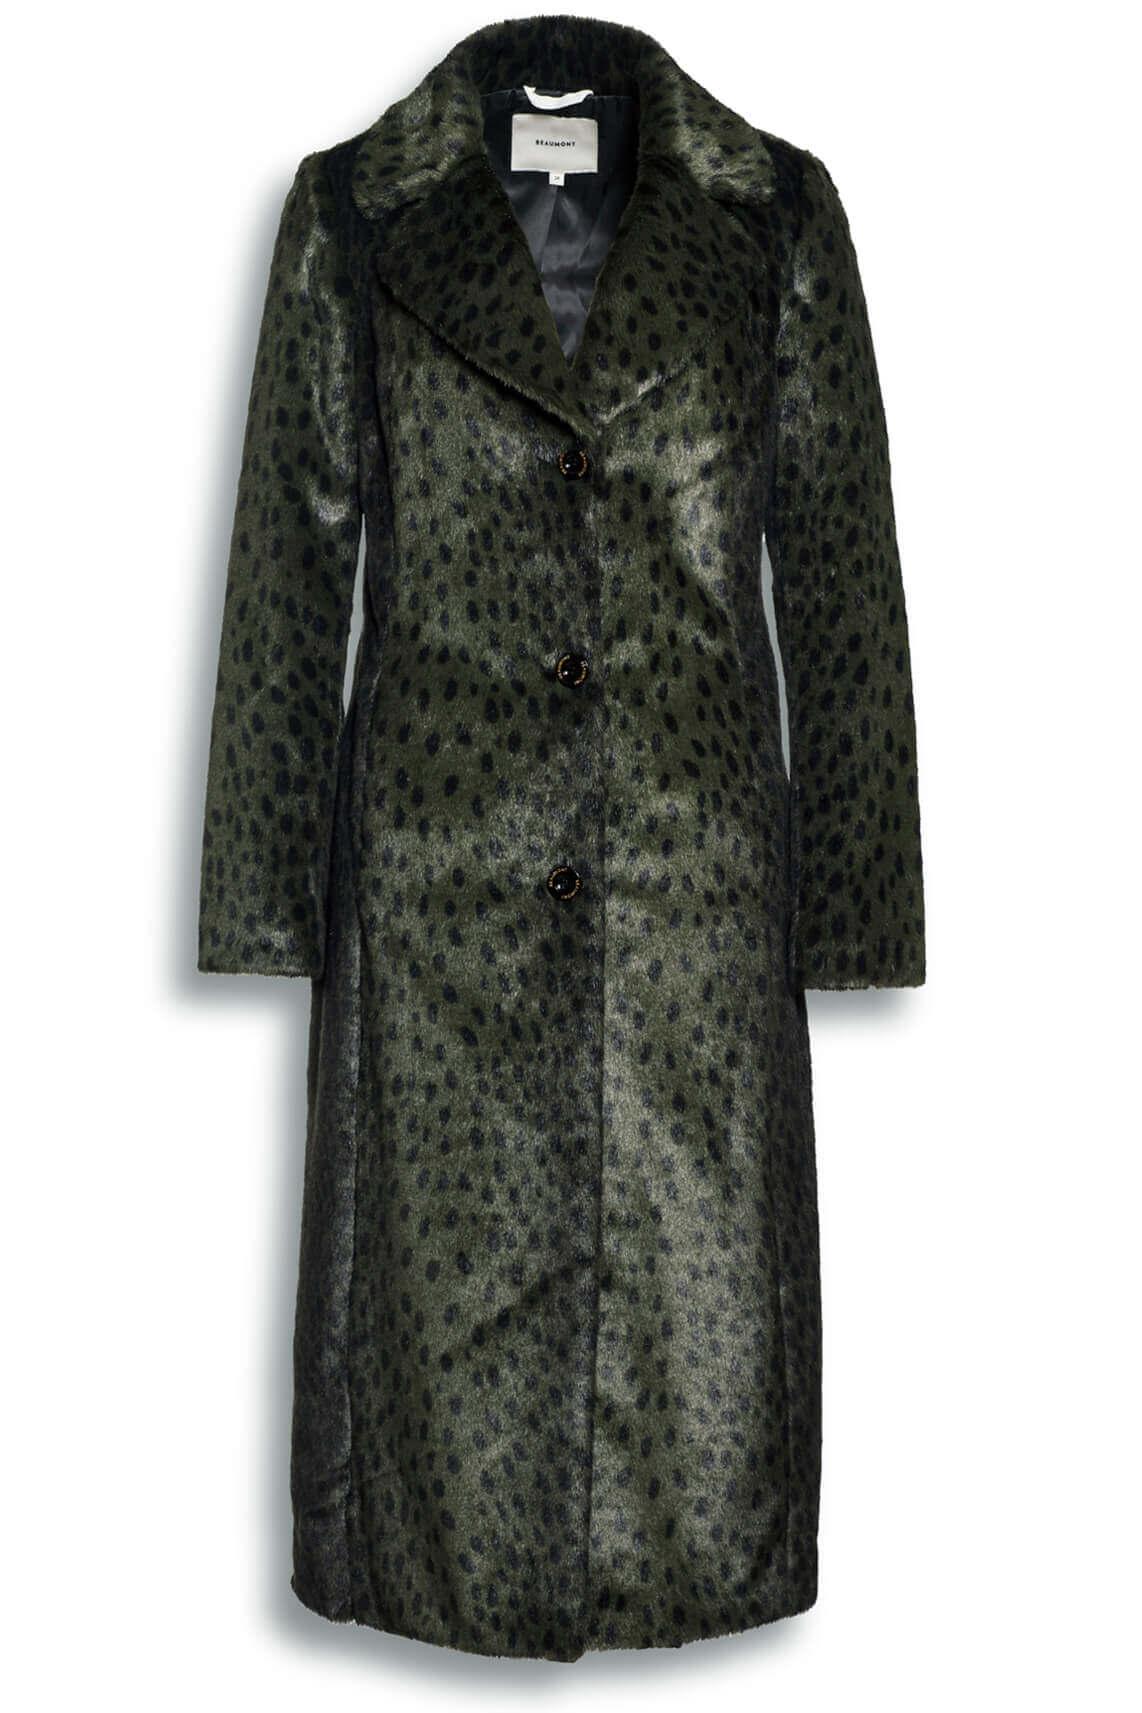 Beaumont Dames Fake fur mantel met animalprint groen